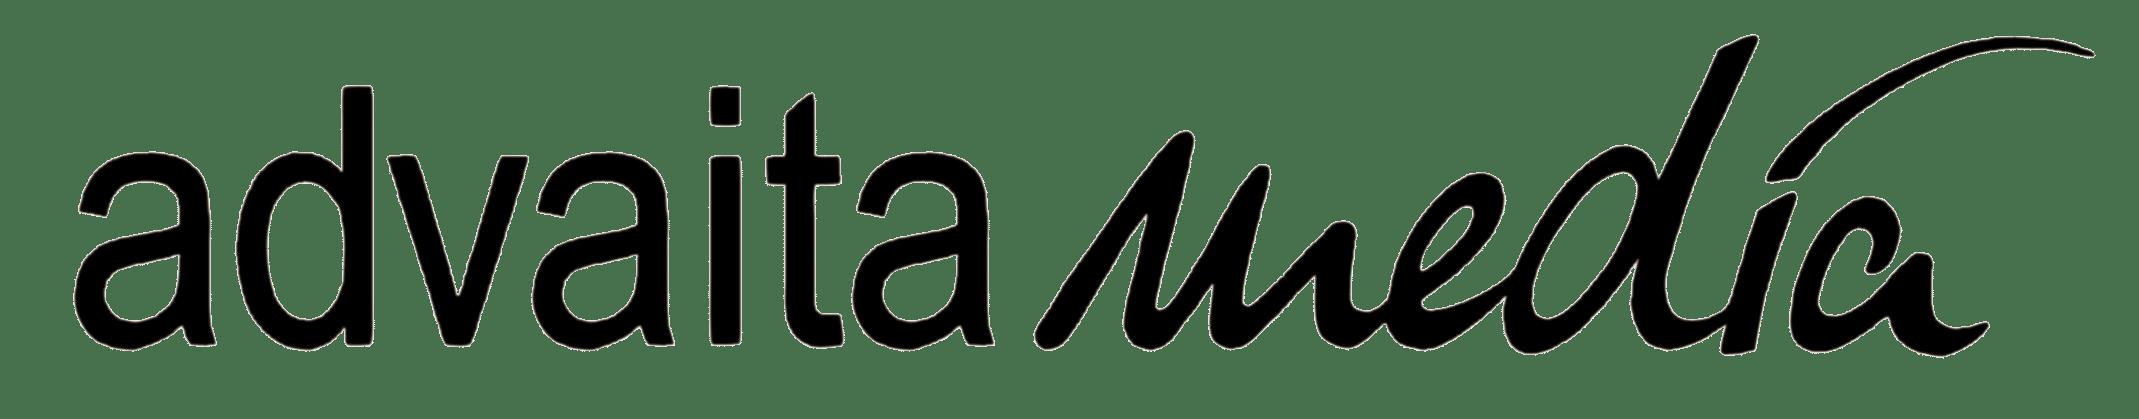 LogoNEU-schwarz_transparent